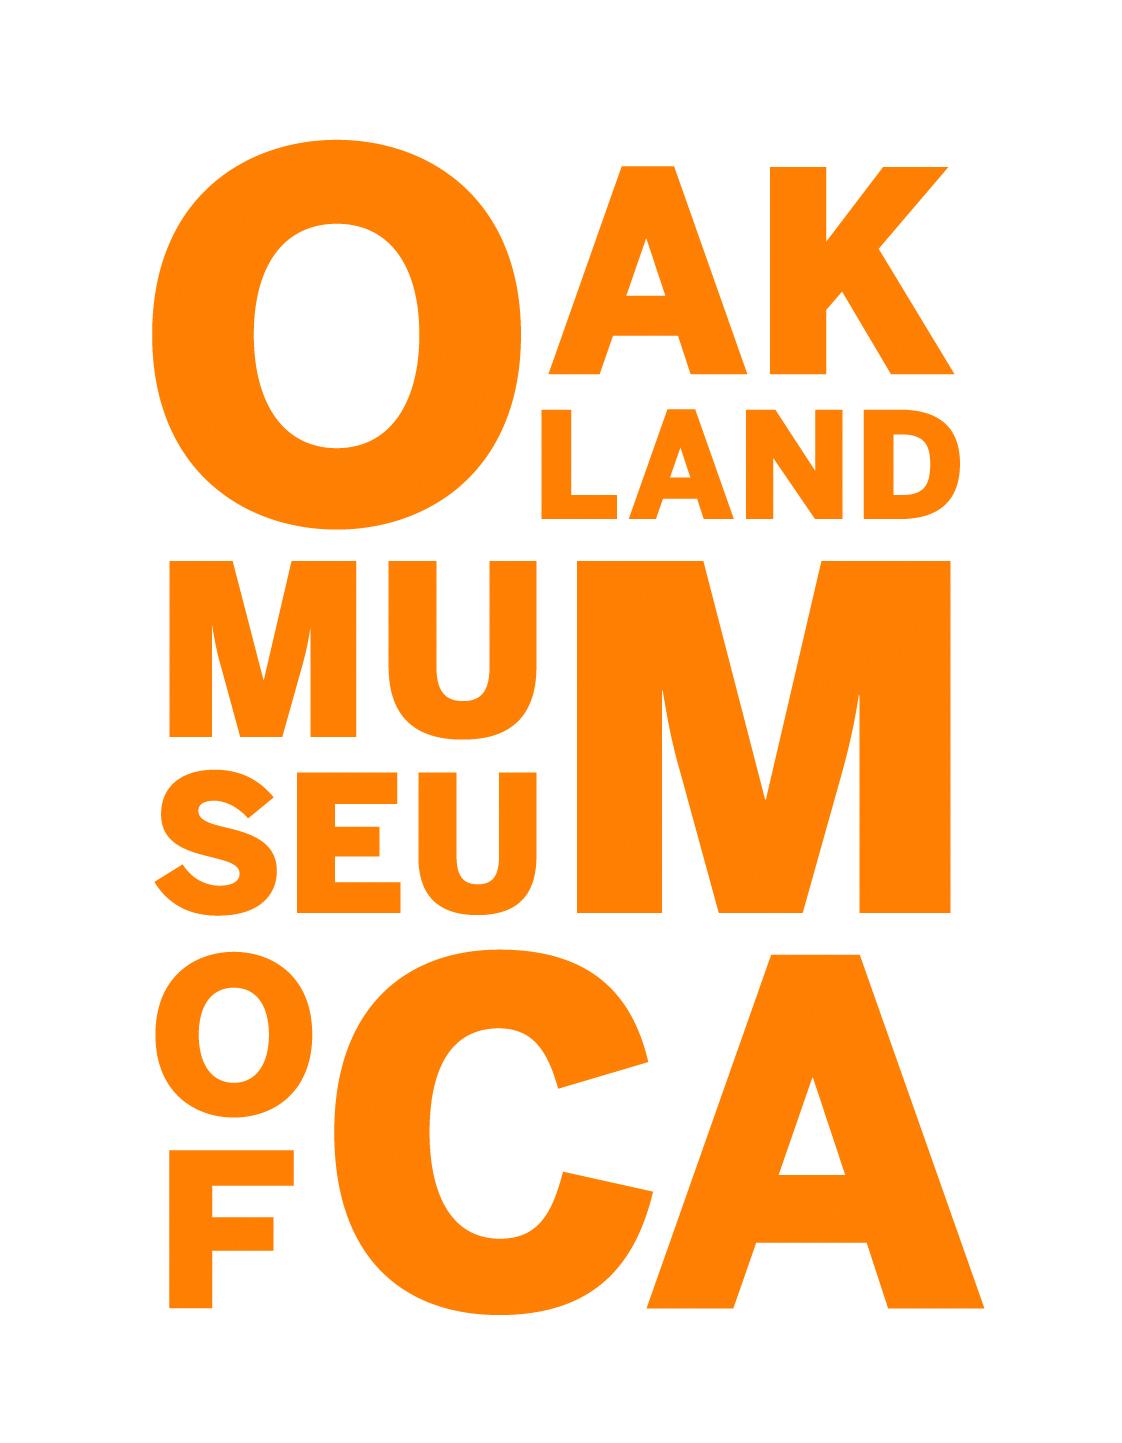 omca_logo_cmyk.jpg